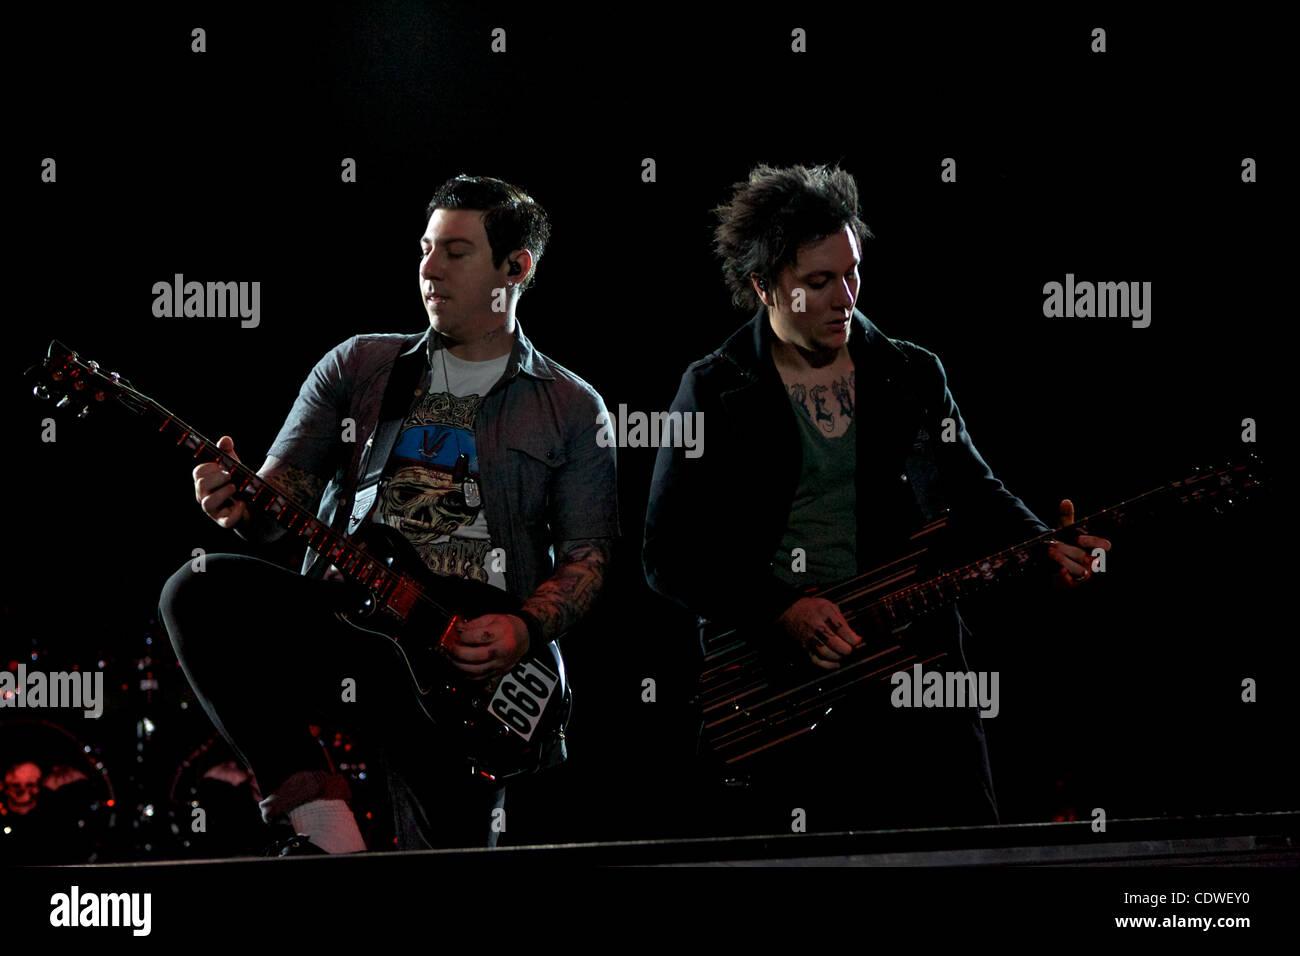 Avenged Sevenfold Tour  United States